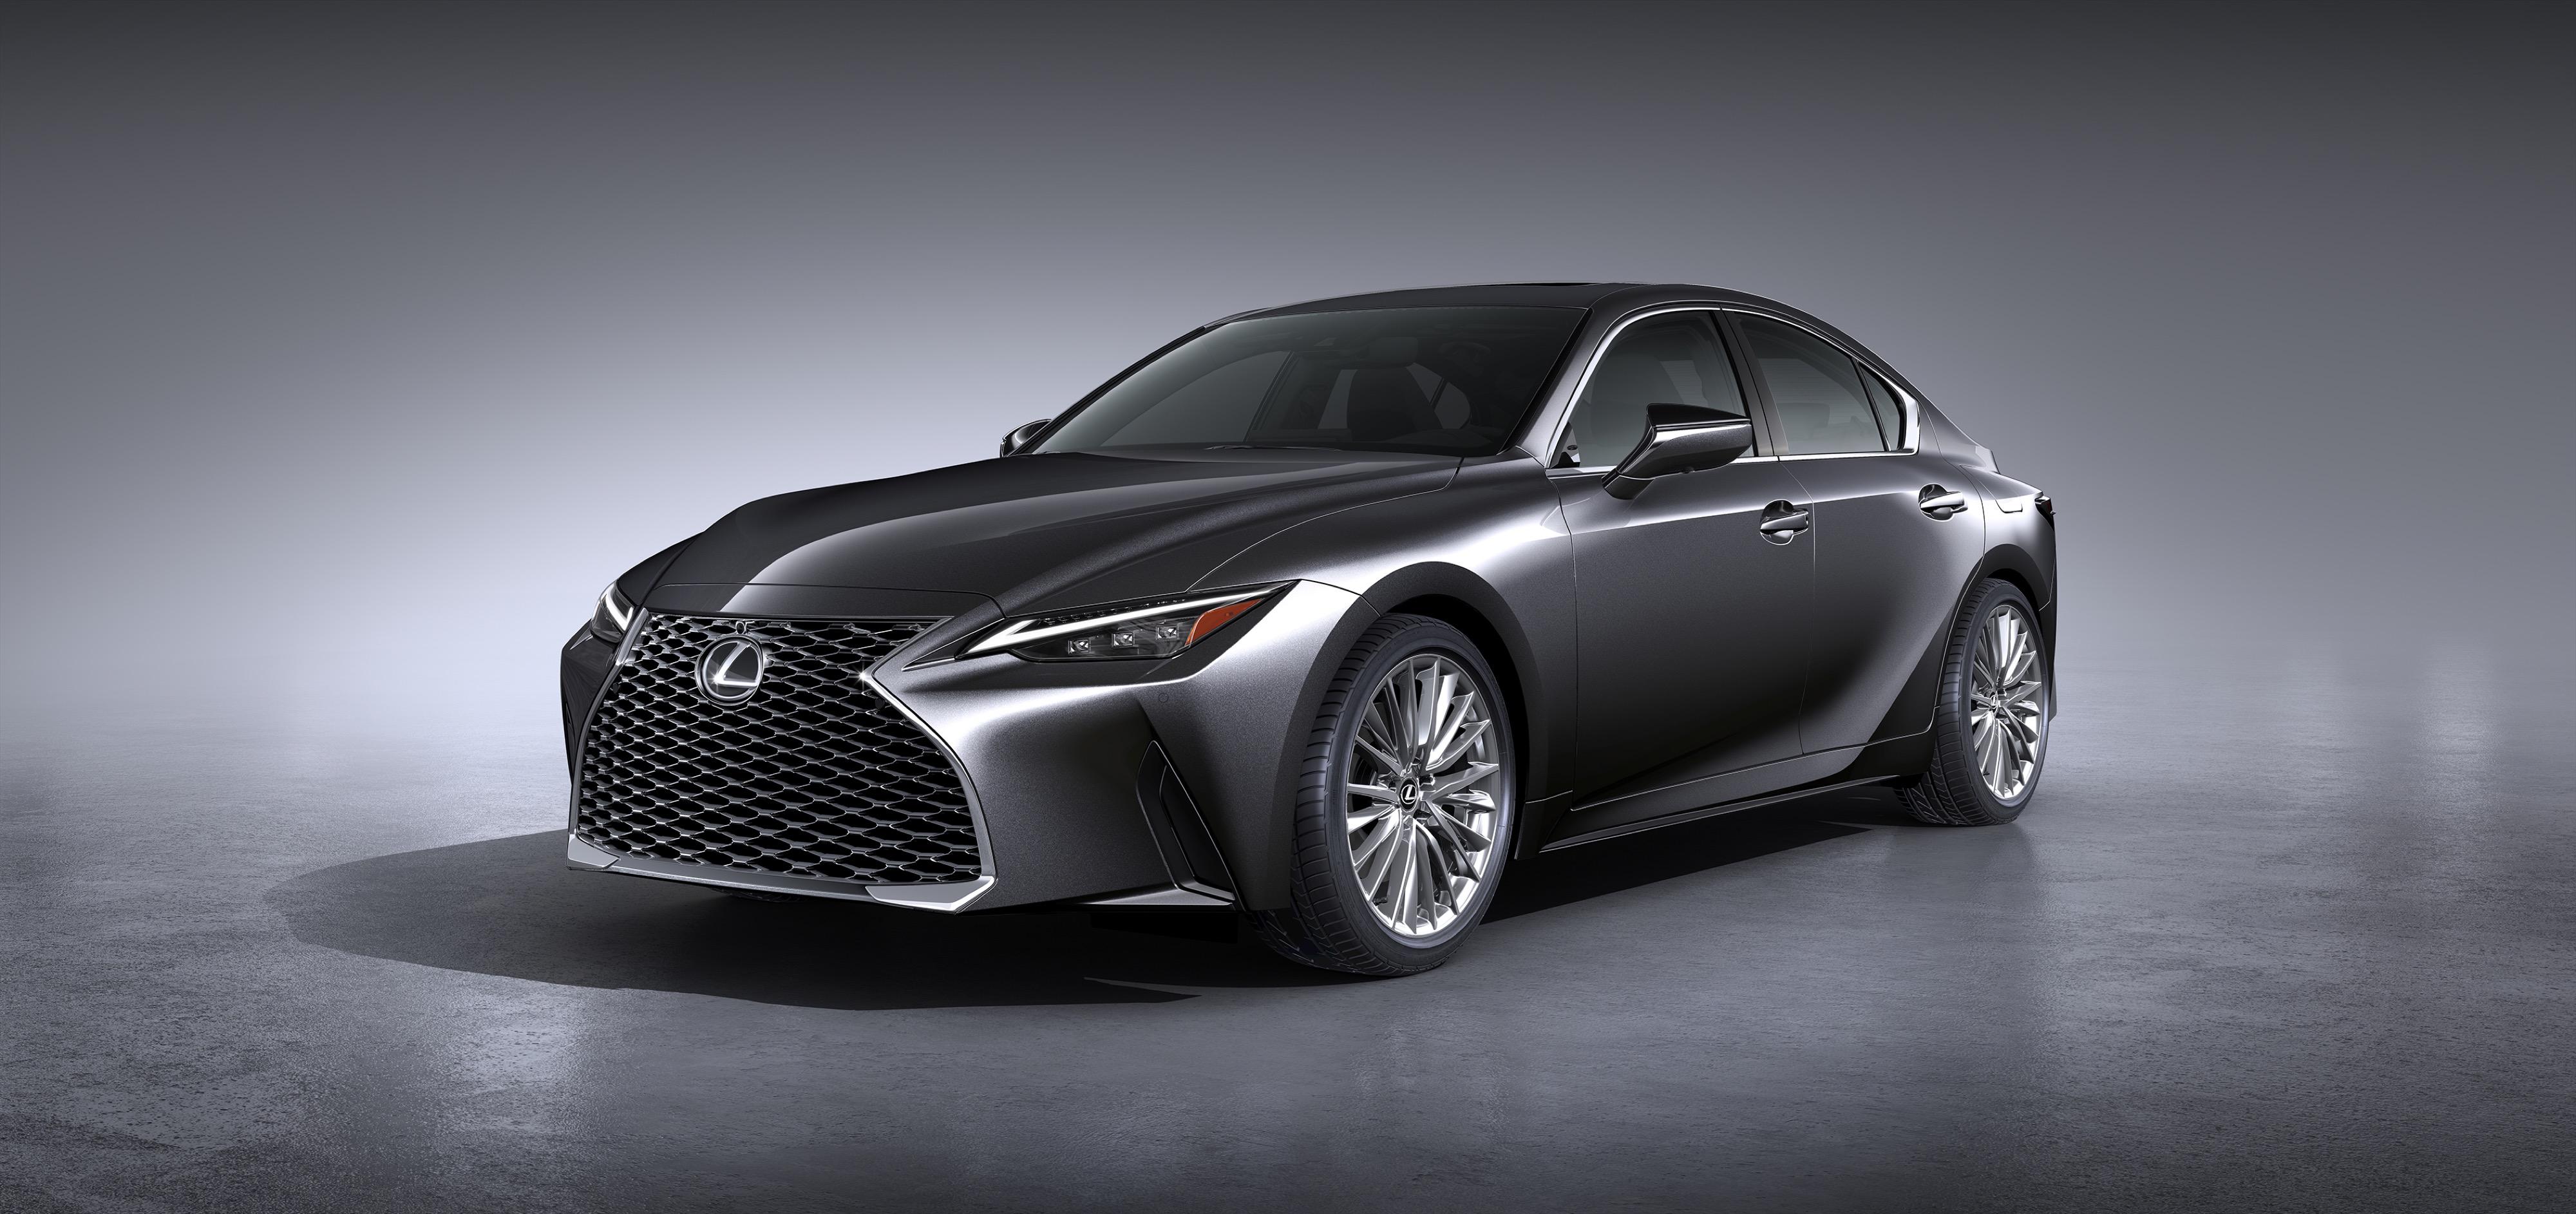 Photo Gallery The New 2021 Lexus Is Sedan Lexus Enthusiast